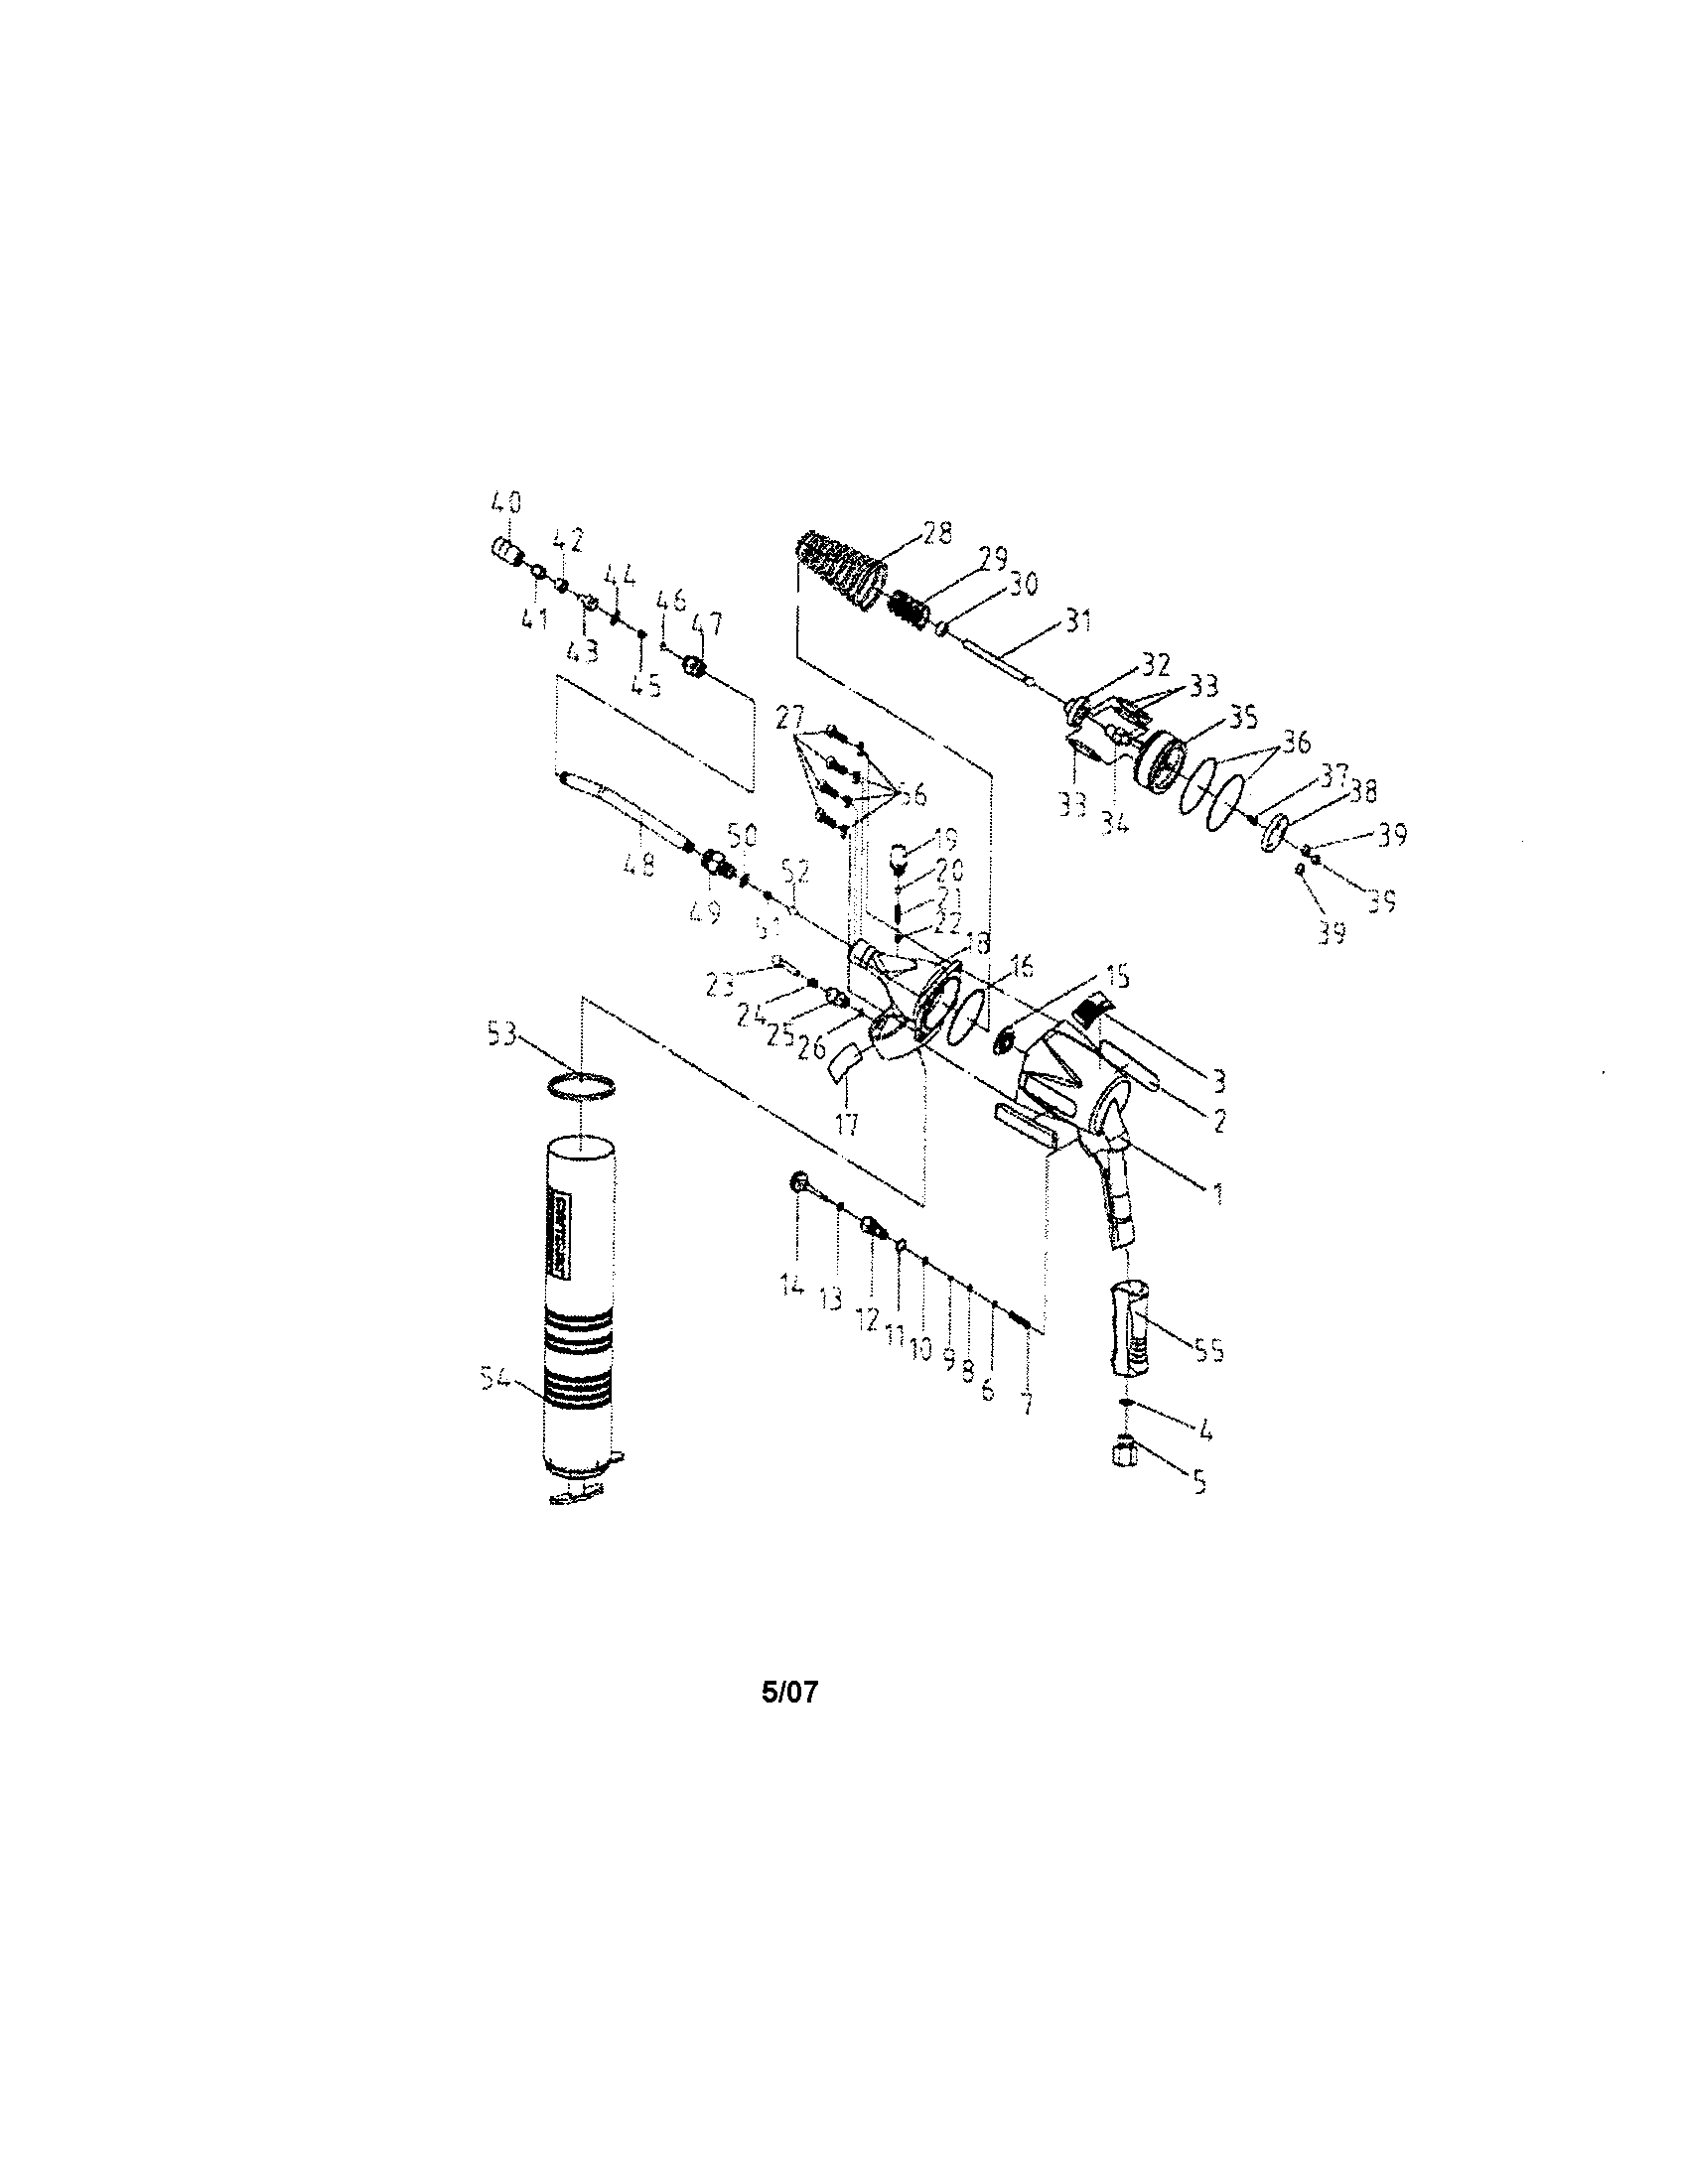 AIR GREASE GUN Diagram & Parts List for Model 875199590